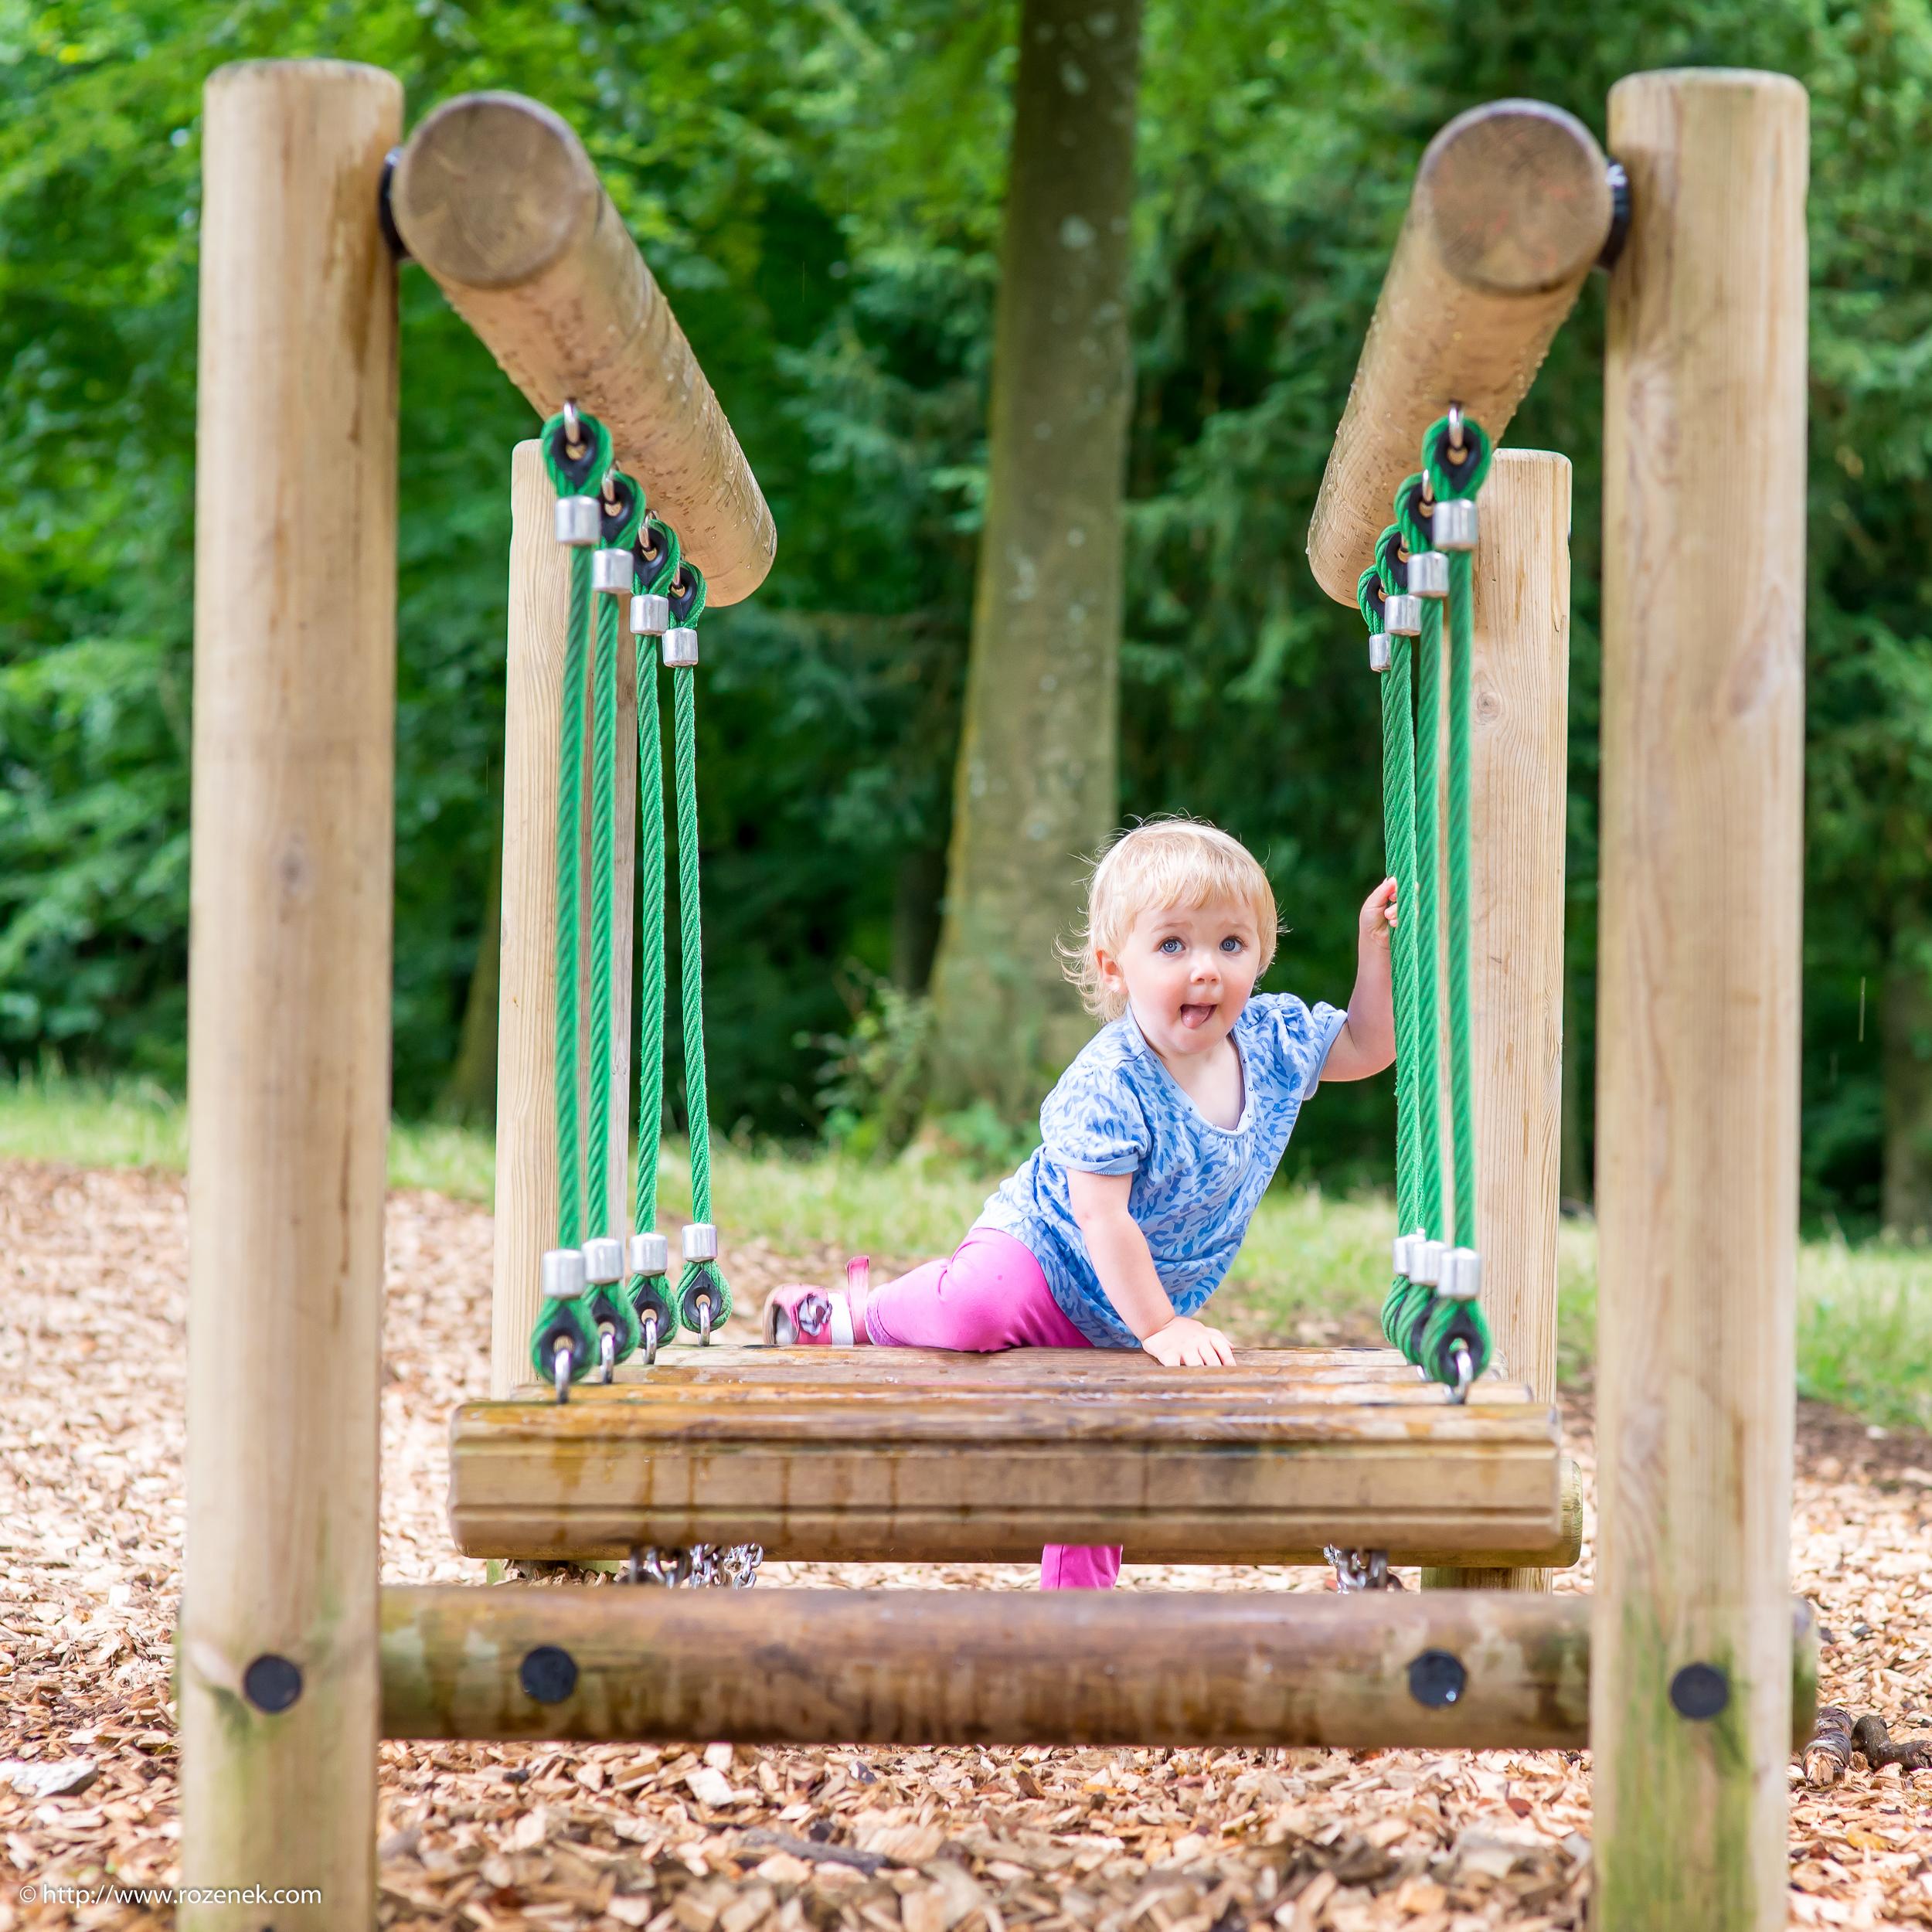 2016.08.05 - Karina at Queen Elizabeth Country Park - 06